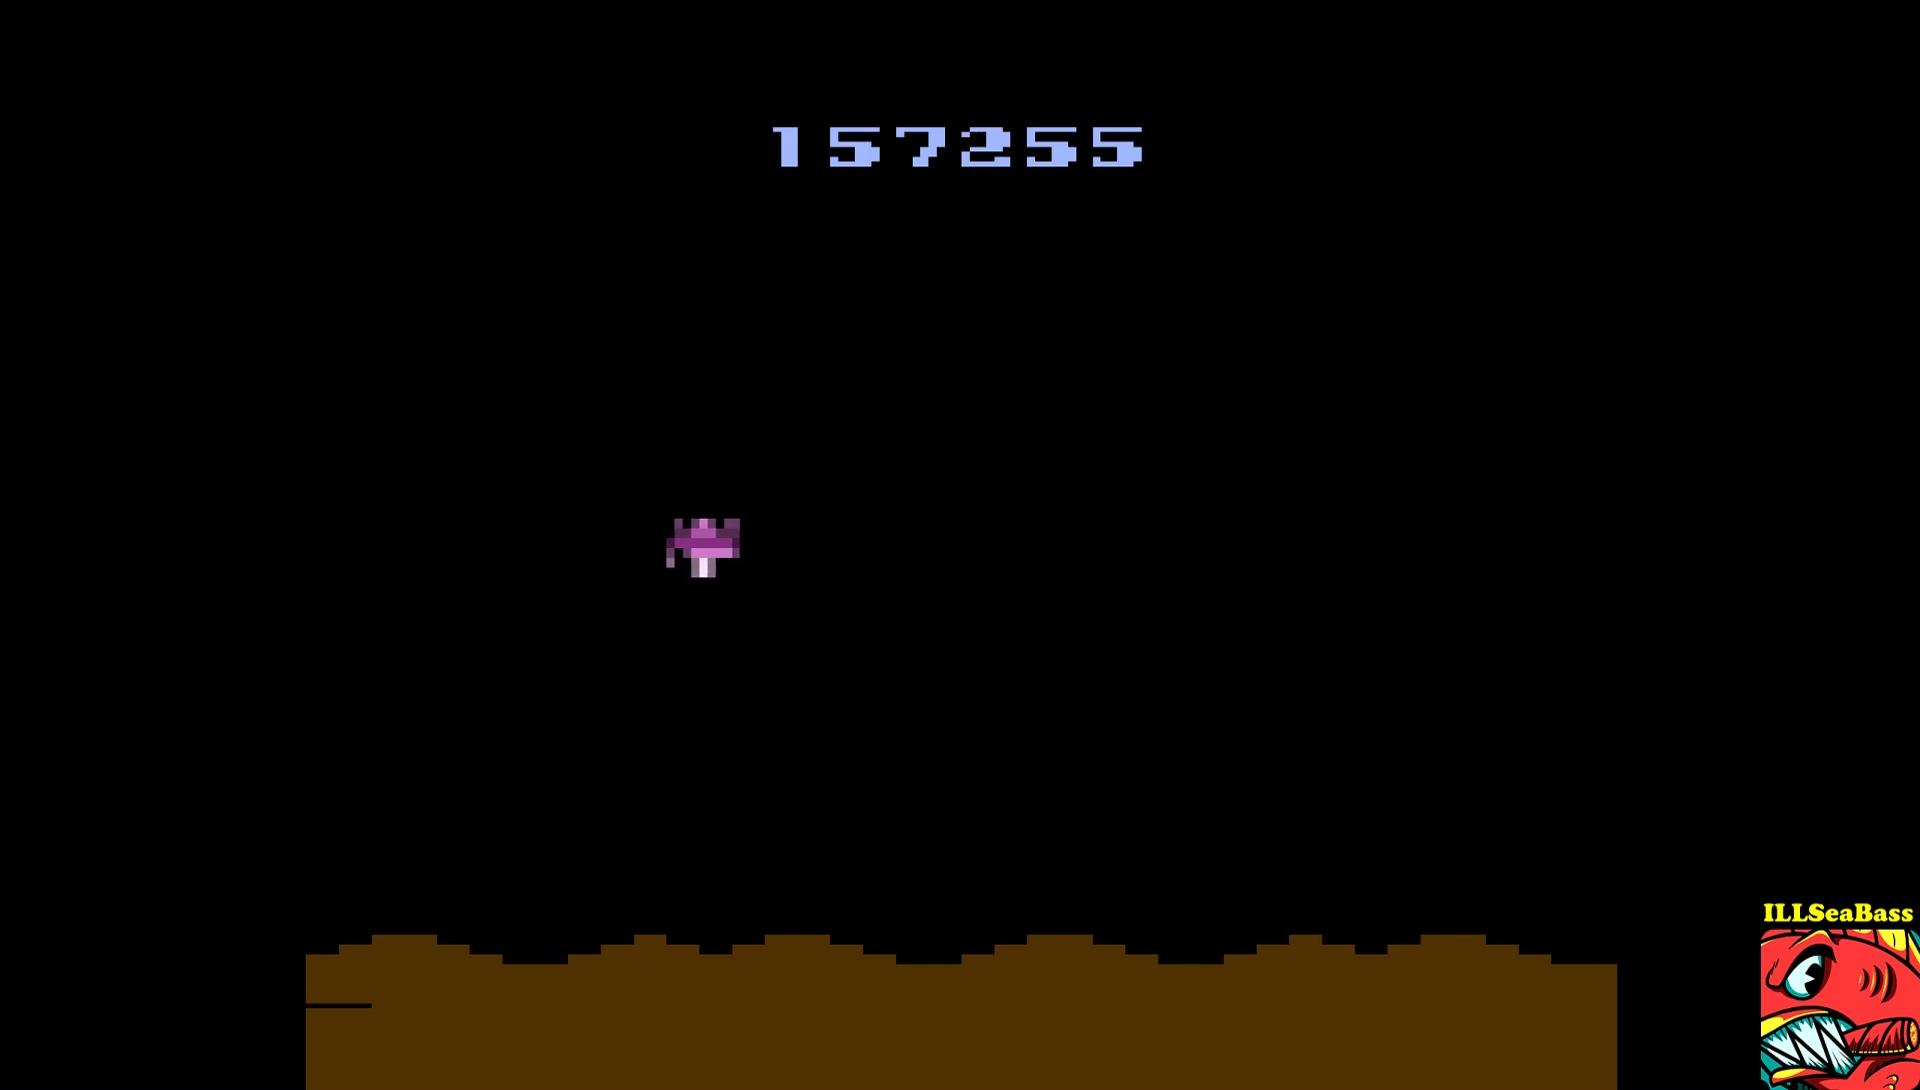 ILLSeaBass: Space Jockey (Atari 2600 Emulated Novice/B Mode) 157,255 points on 2017-03-25 13:52:02